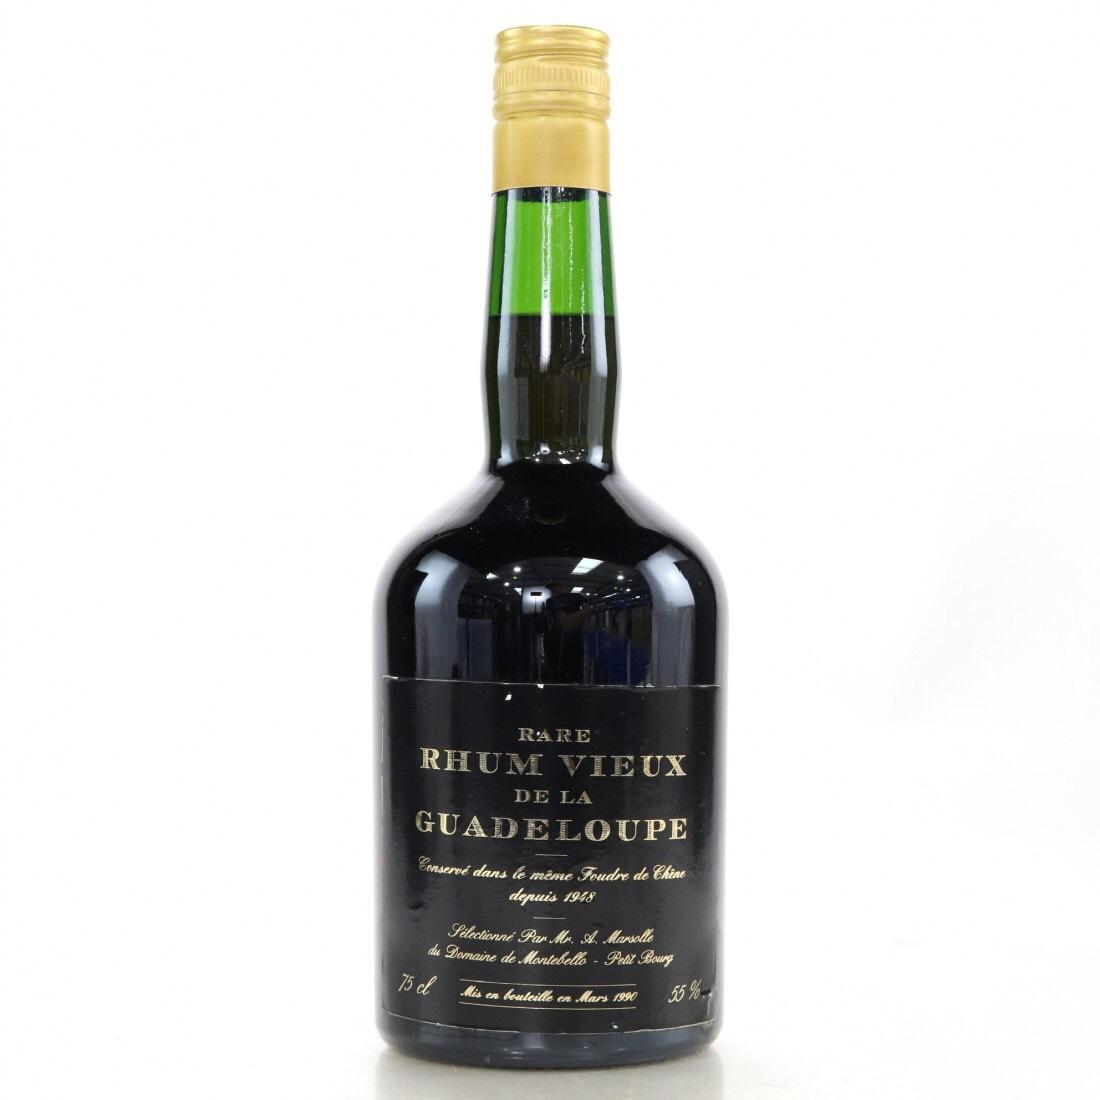 Bottle image of Montebello Rare Rhum Vieux